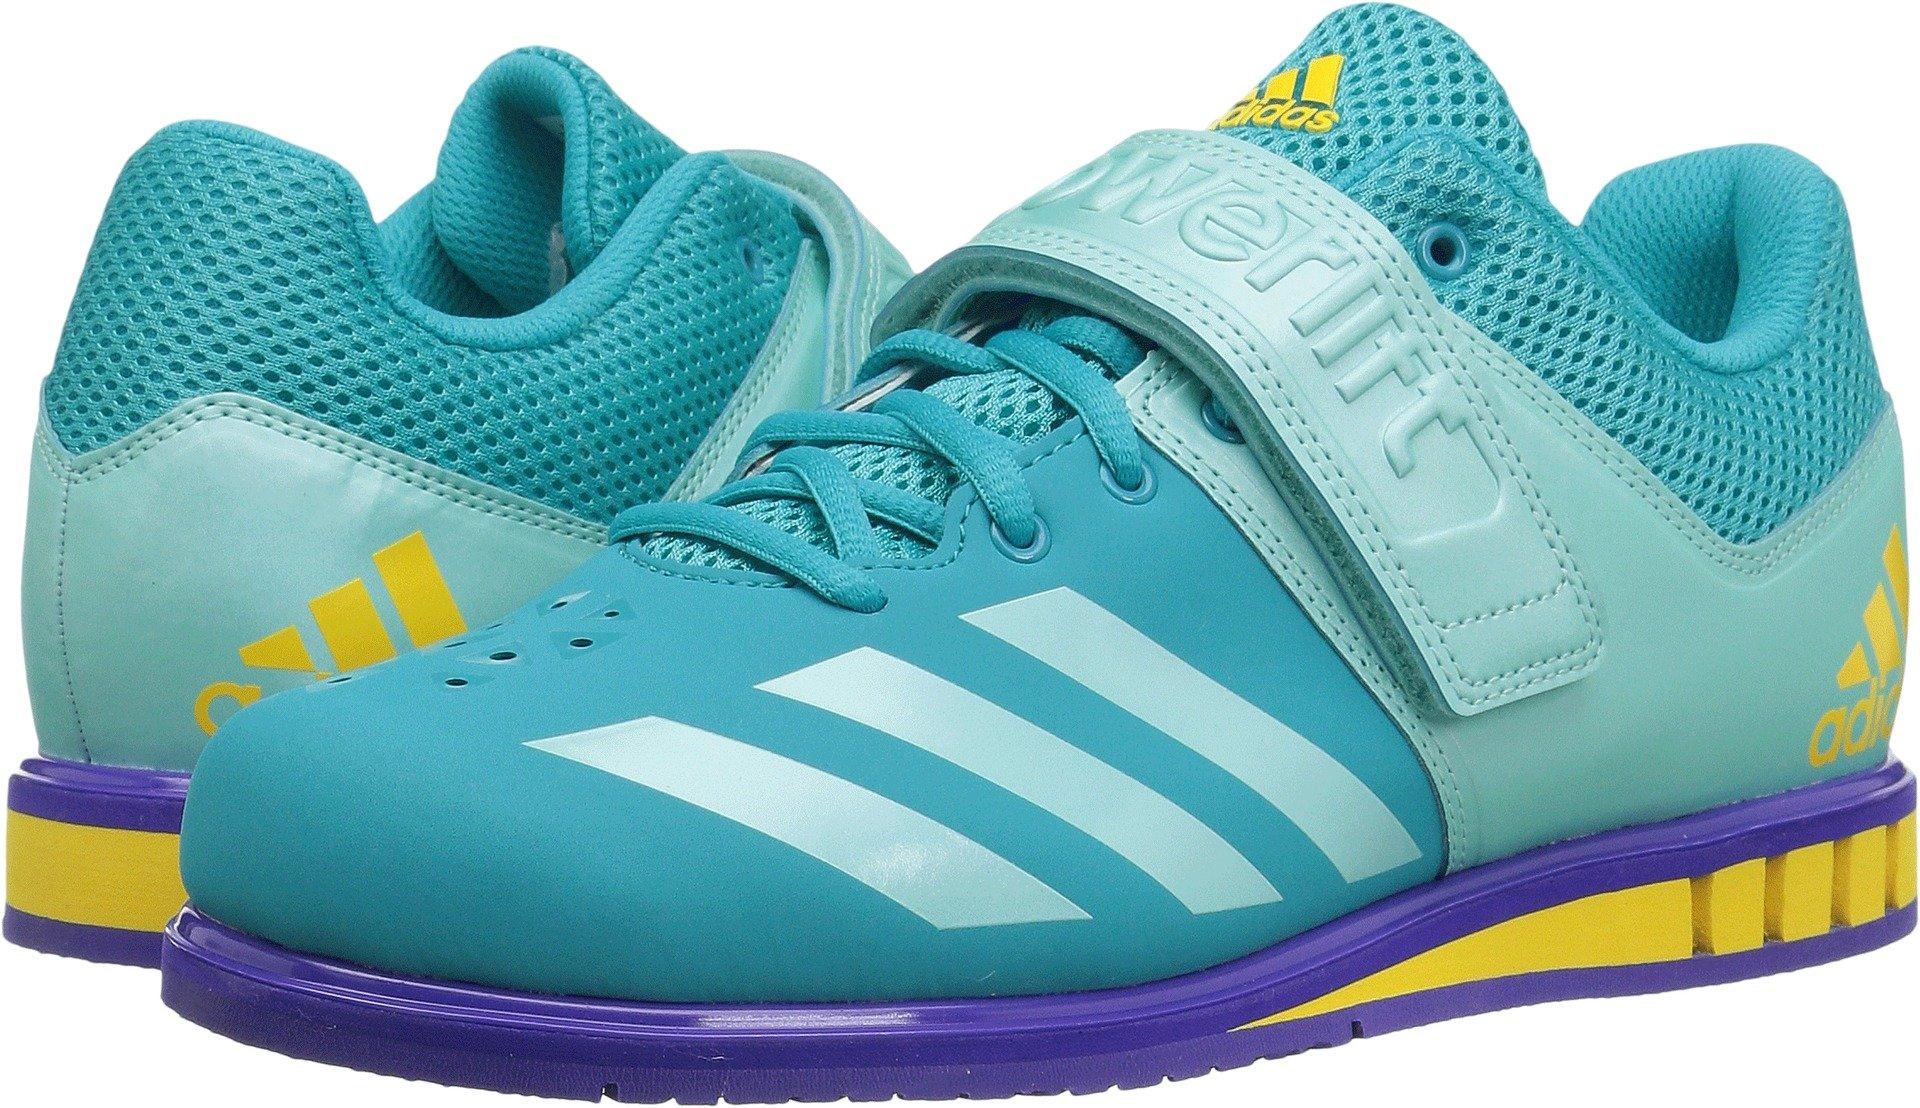 adidas Performance Women's Powerlift-3-1 w Cross-Trainer Shoes, Energy Blue/Energy Aqua/Noble Ink, (8 Medium US)